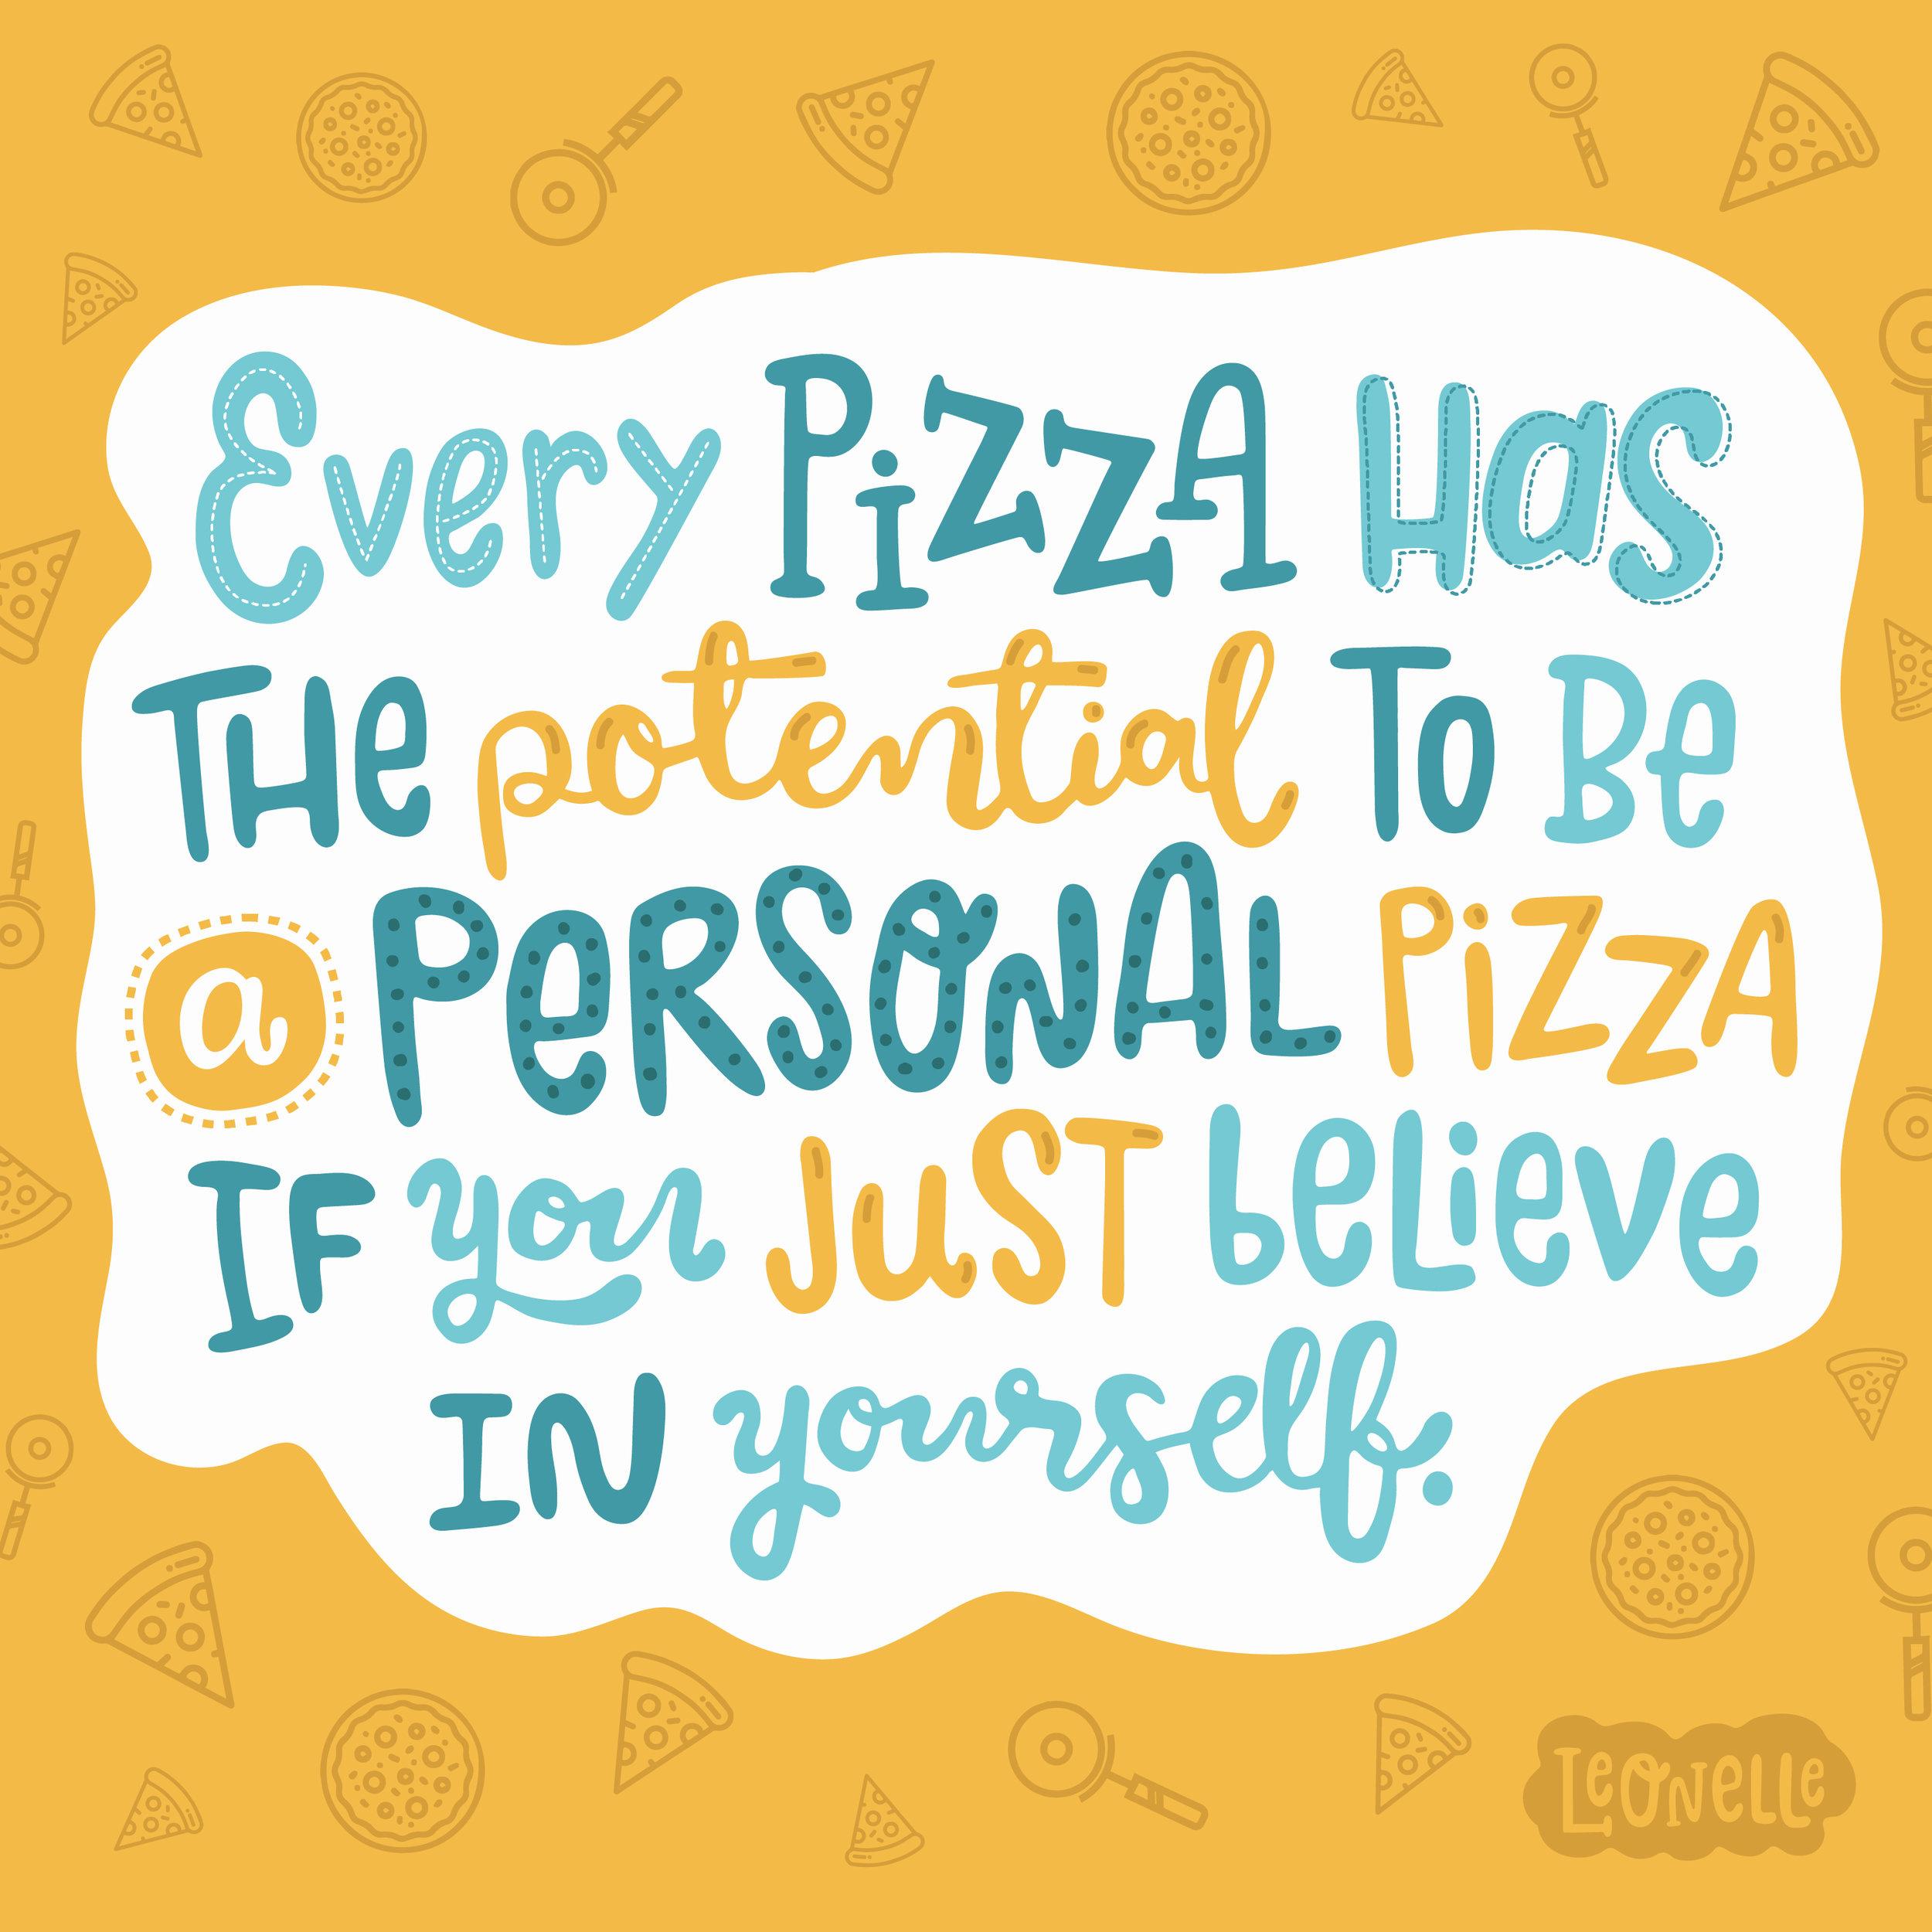 PersonalPizza.jpg